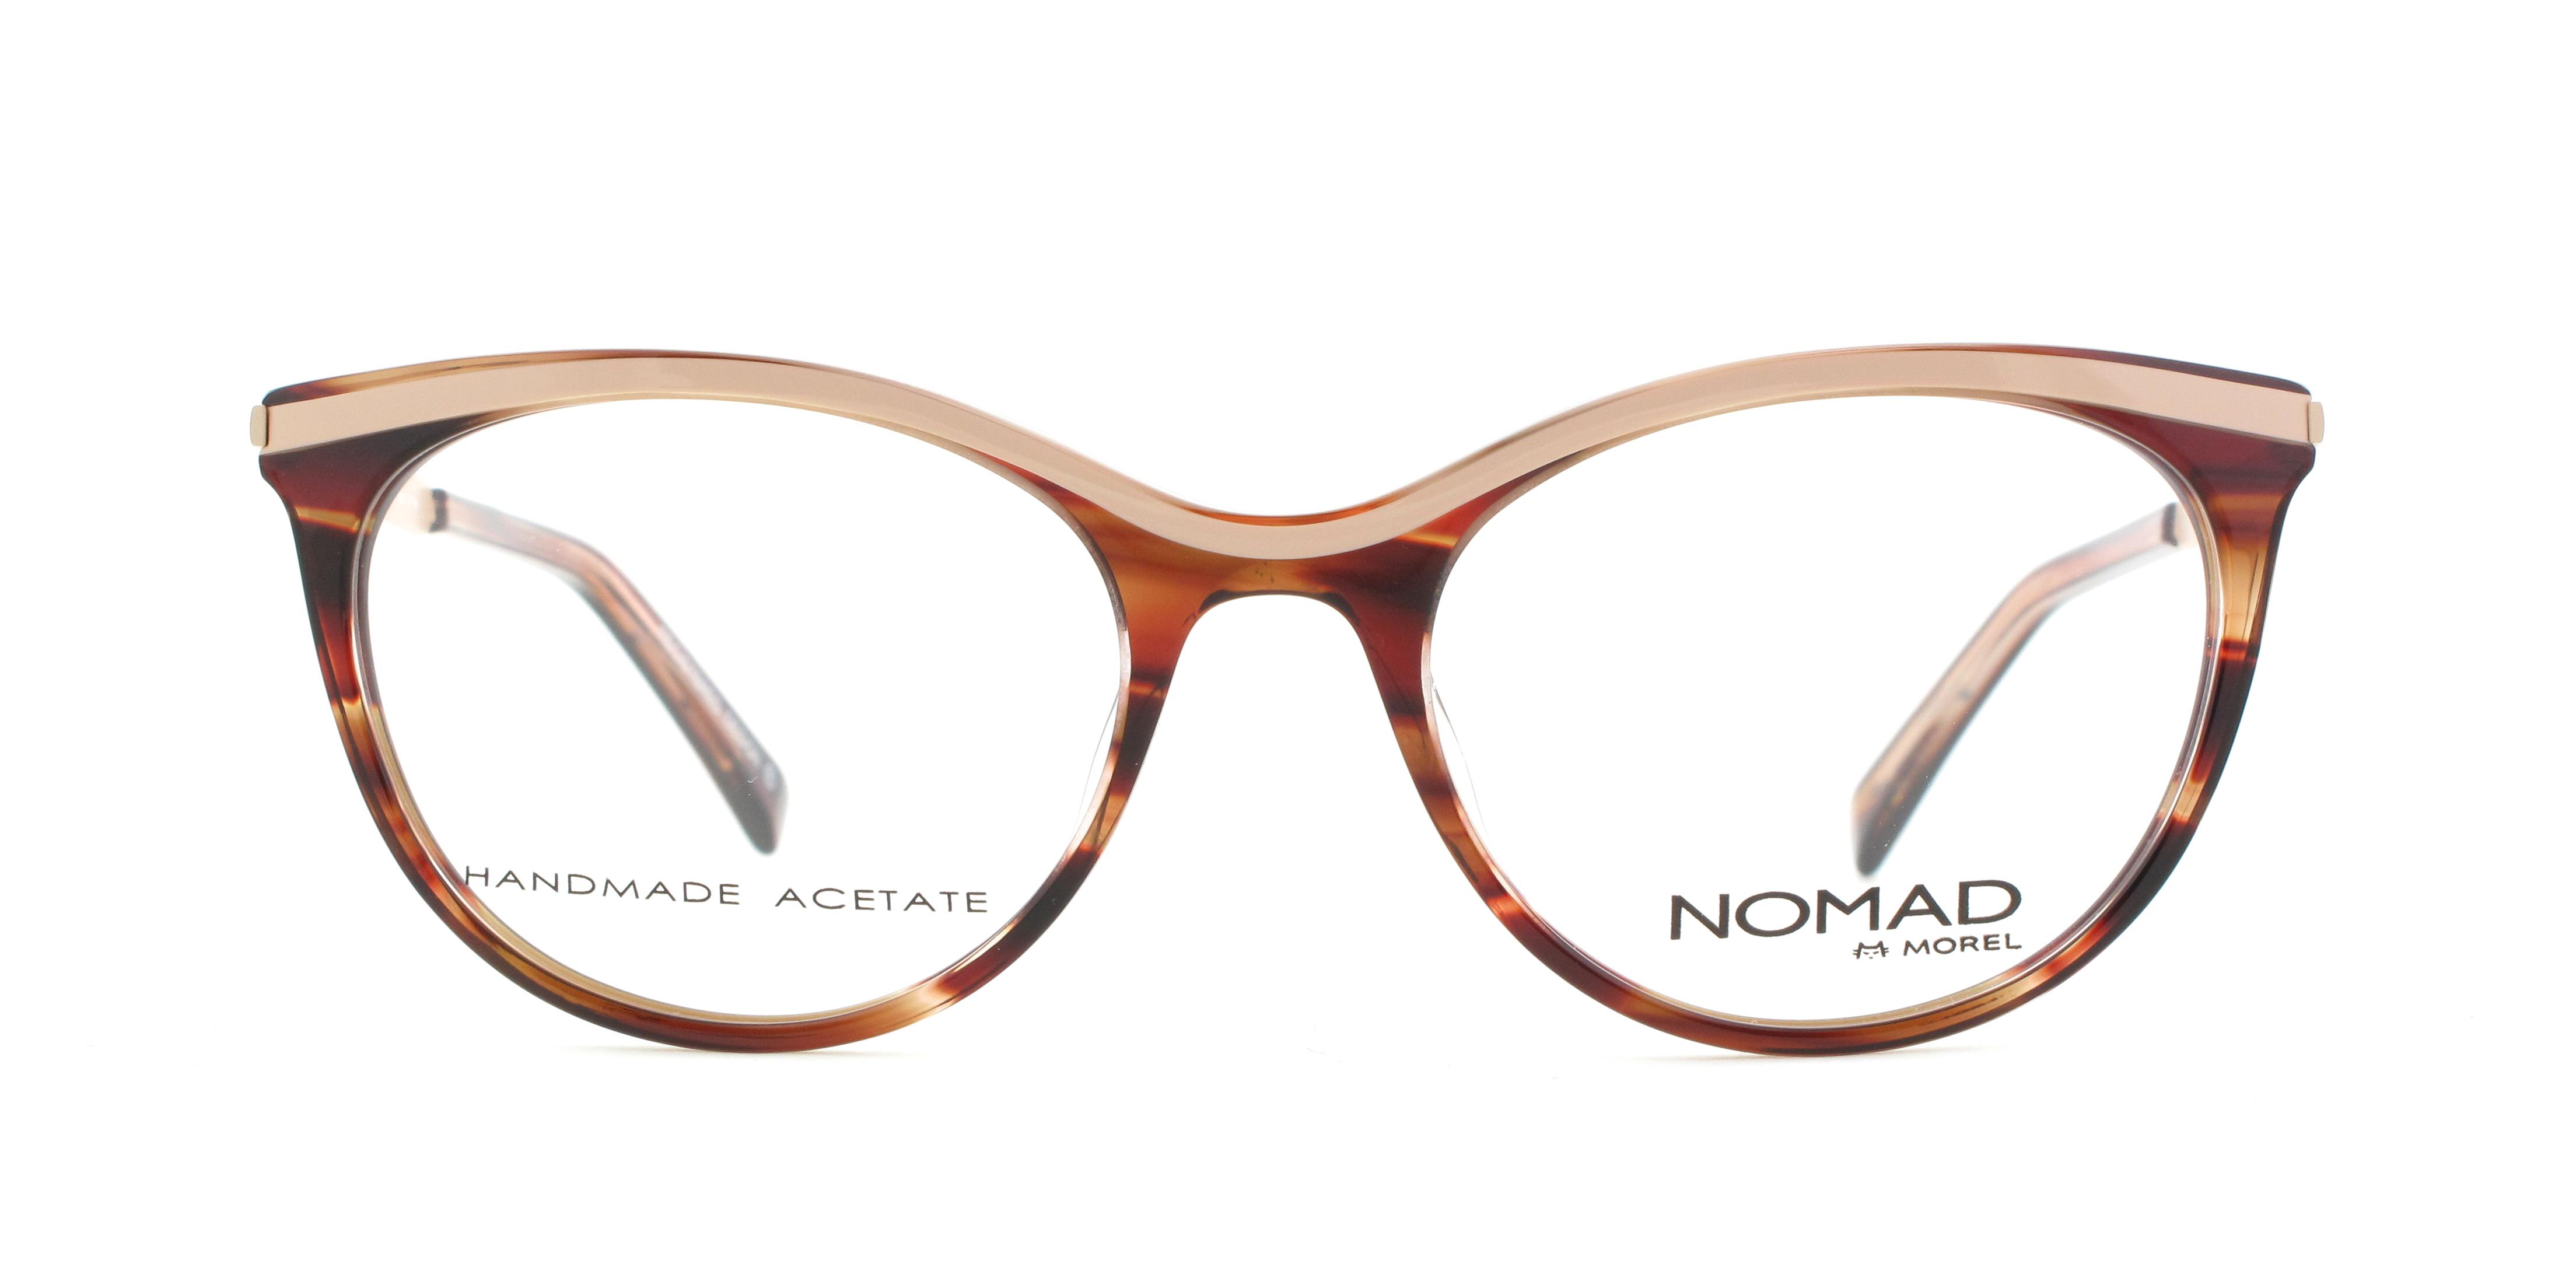 comment choisir ses lunettes de vue femme finest comment bien choisir ses lunettes de repos. Black Bedroom Furniture Sets. Home Design Ideas